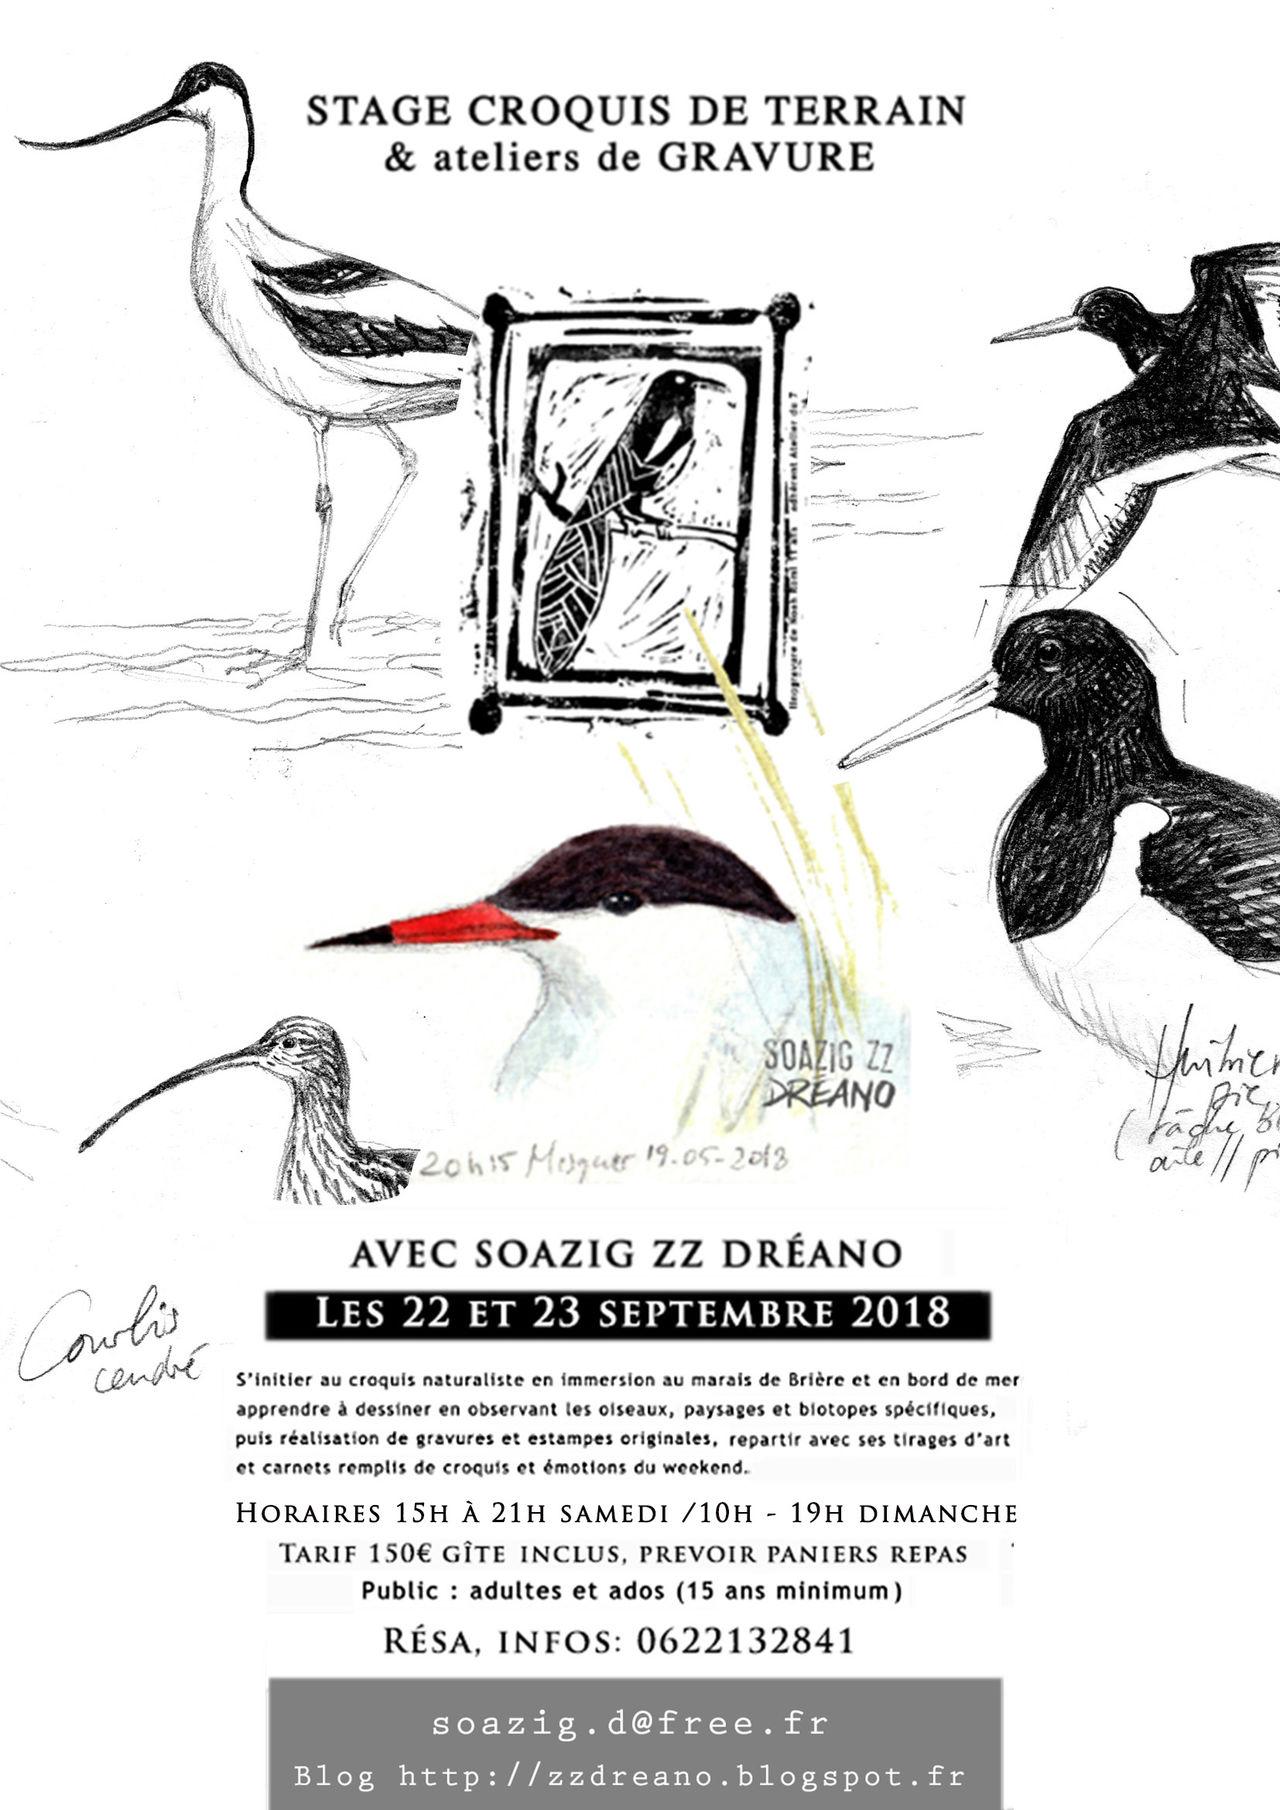 #209571 Fly stage dessin naturaliste et gravure